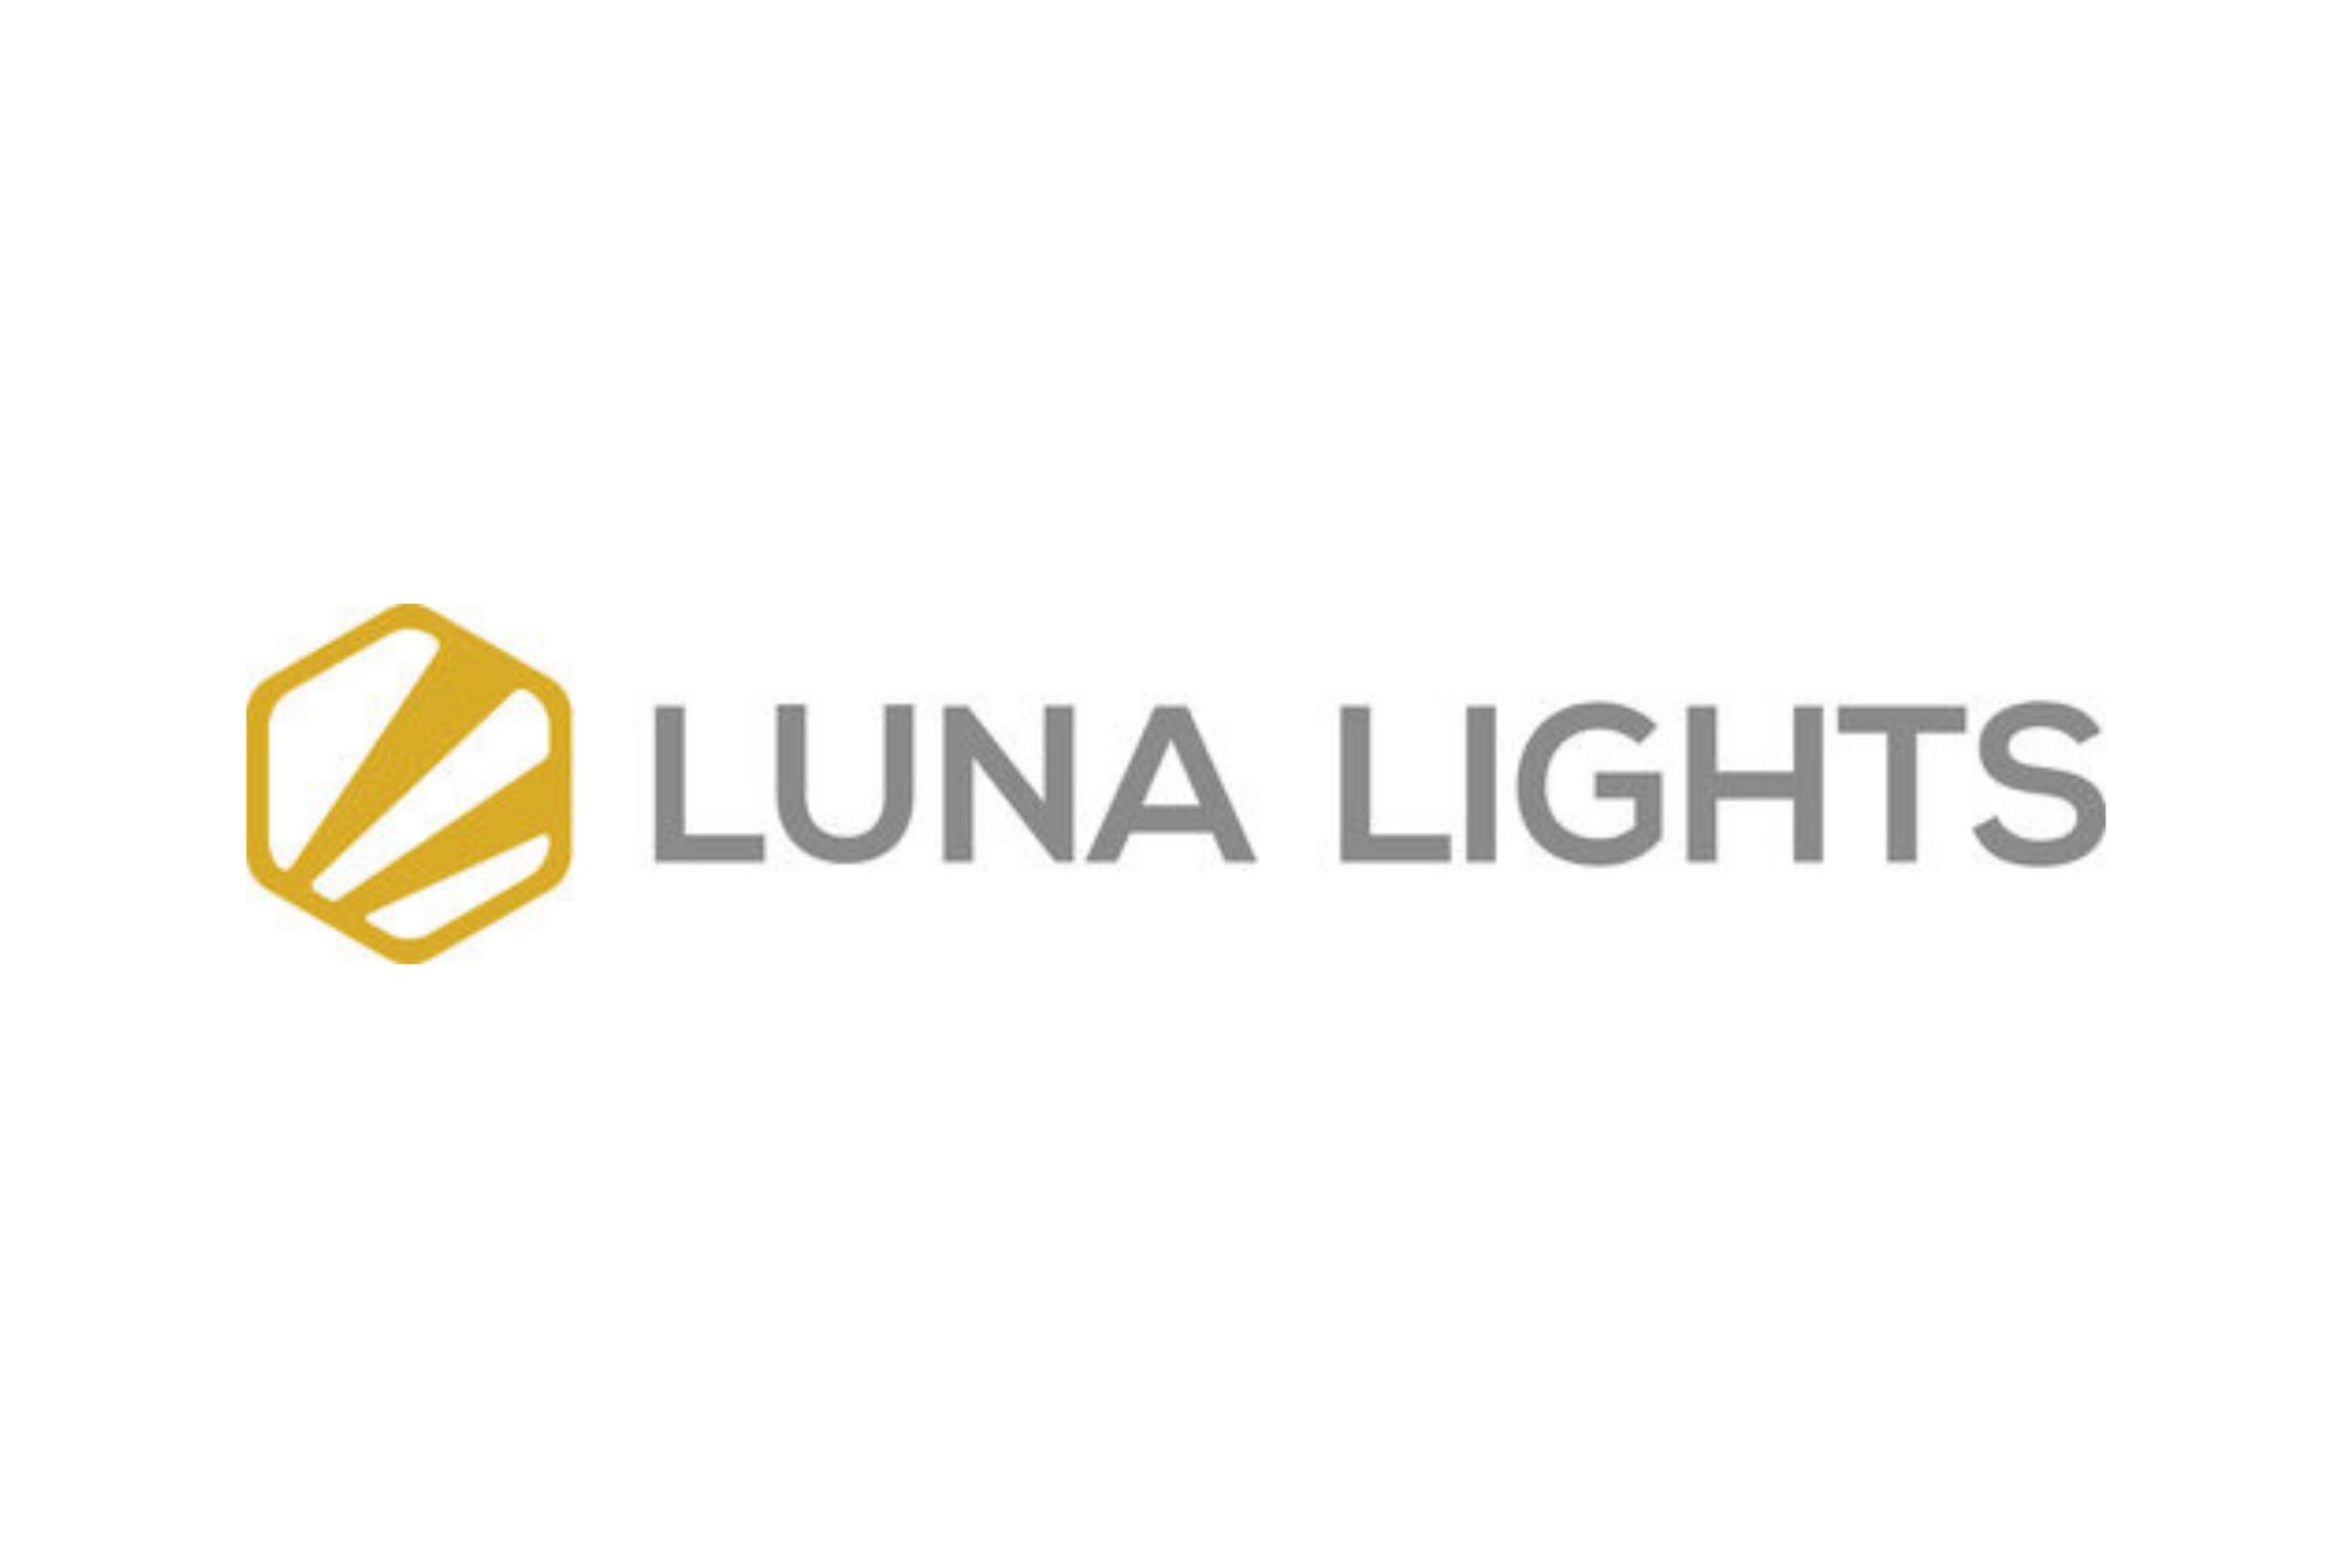 Luna Lights